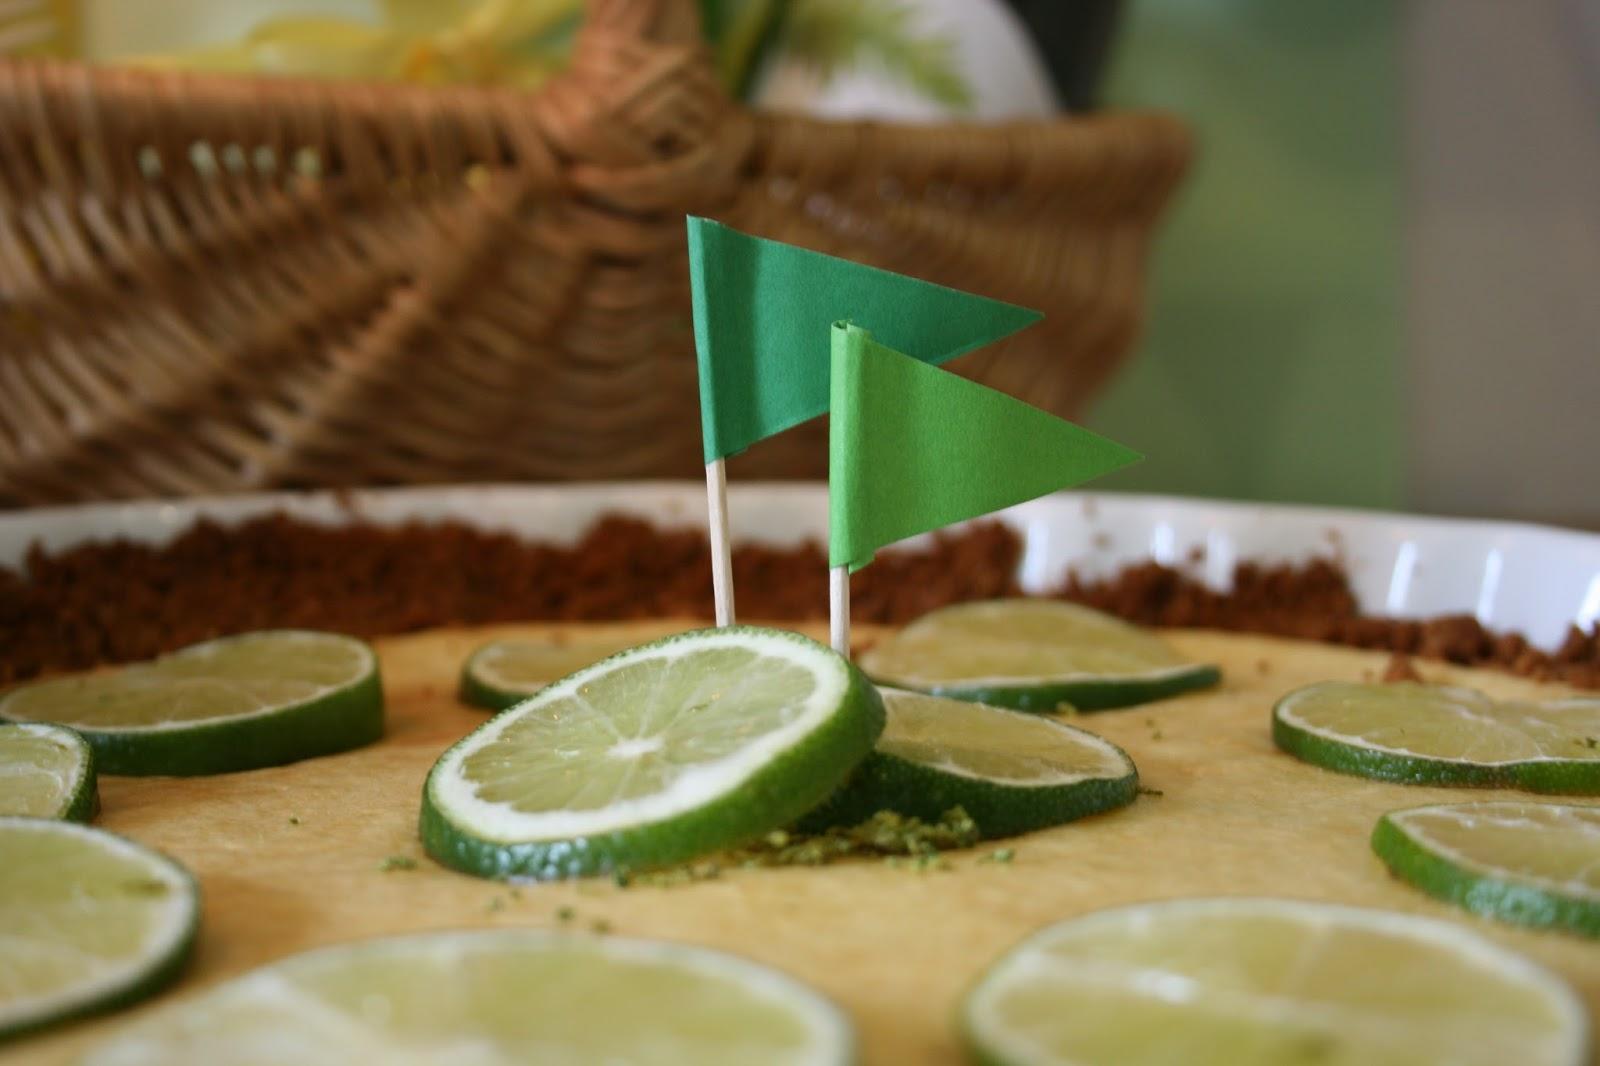 Einweihungsparty Diy Rezept Fur Key Lime Pie Mintundmeer